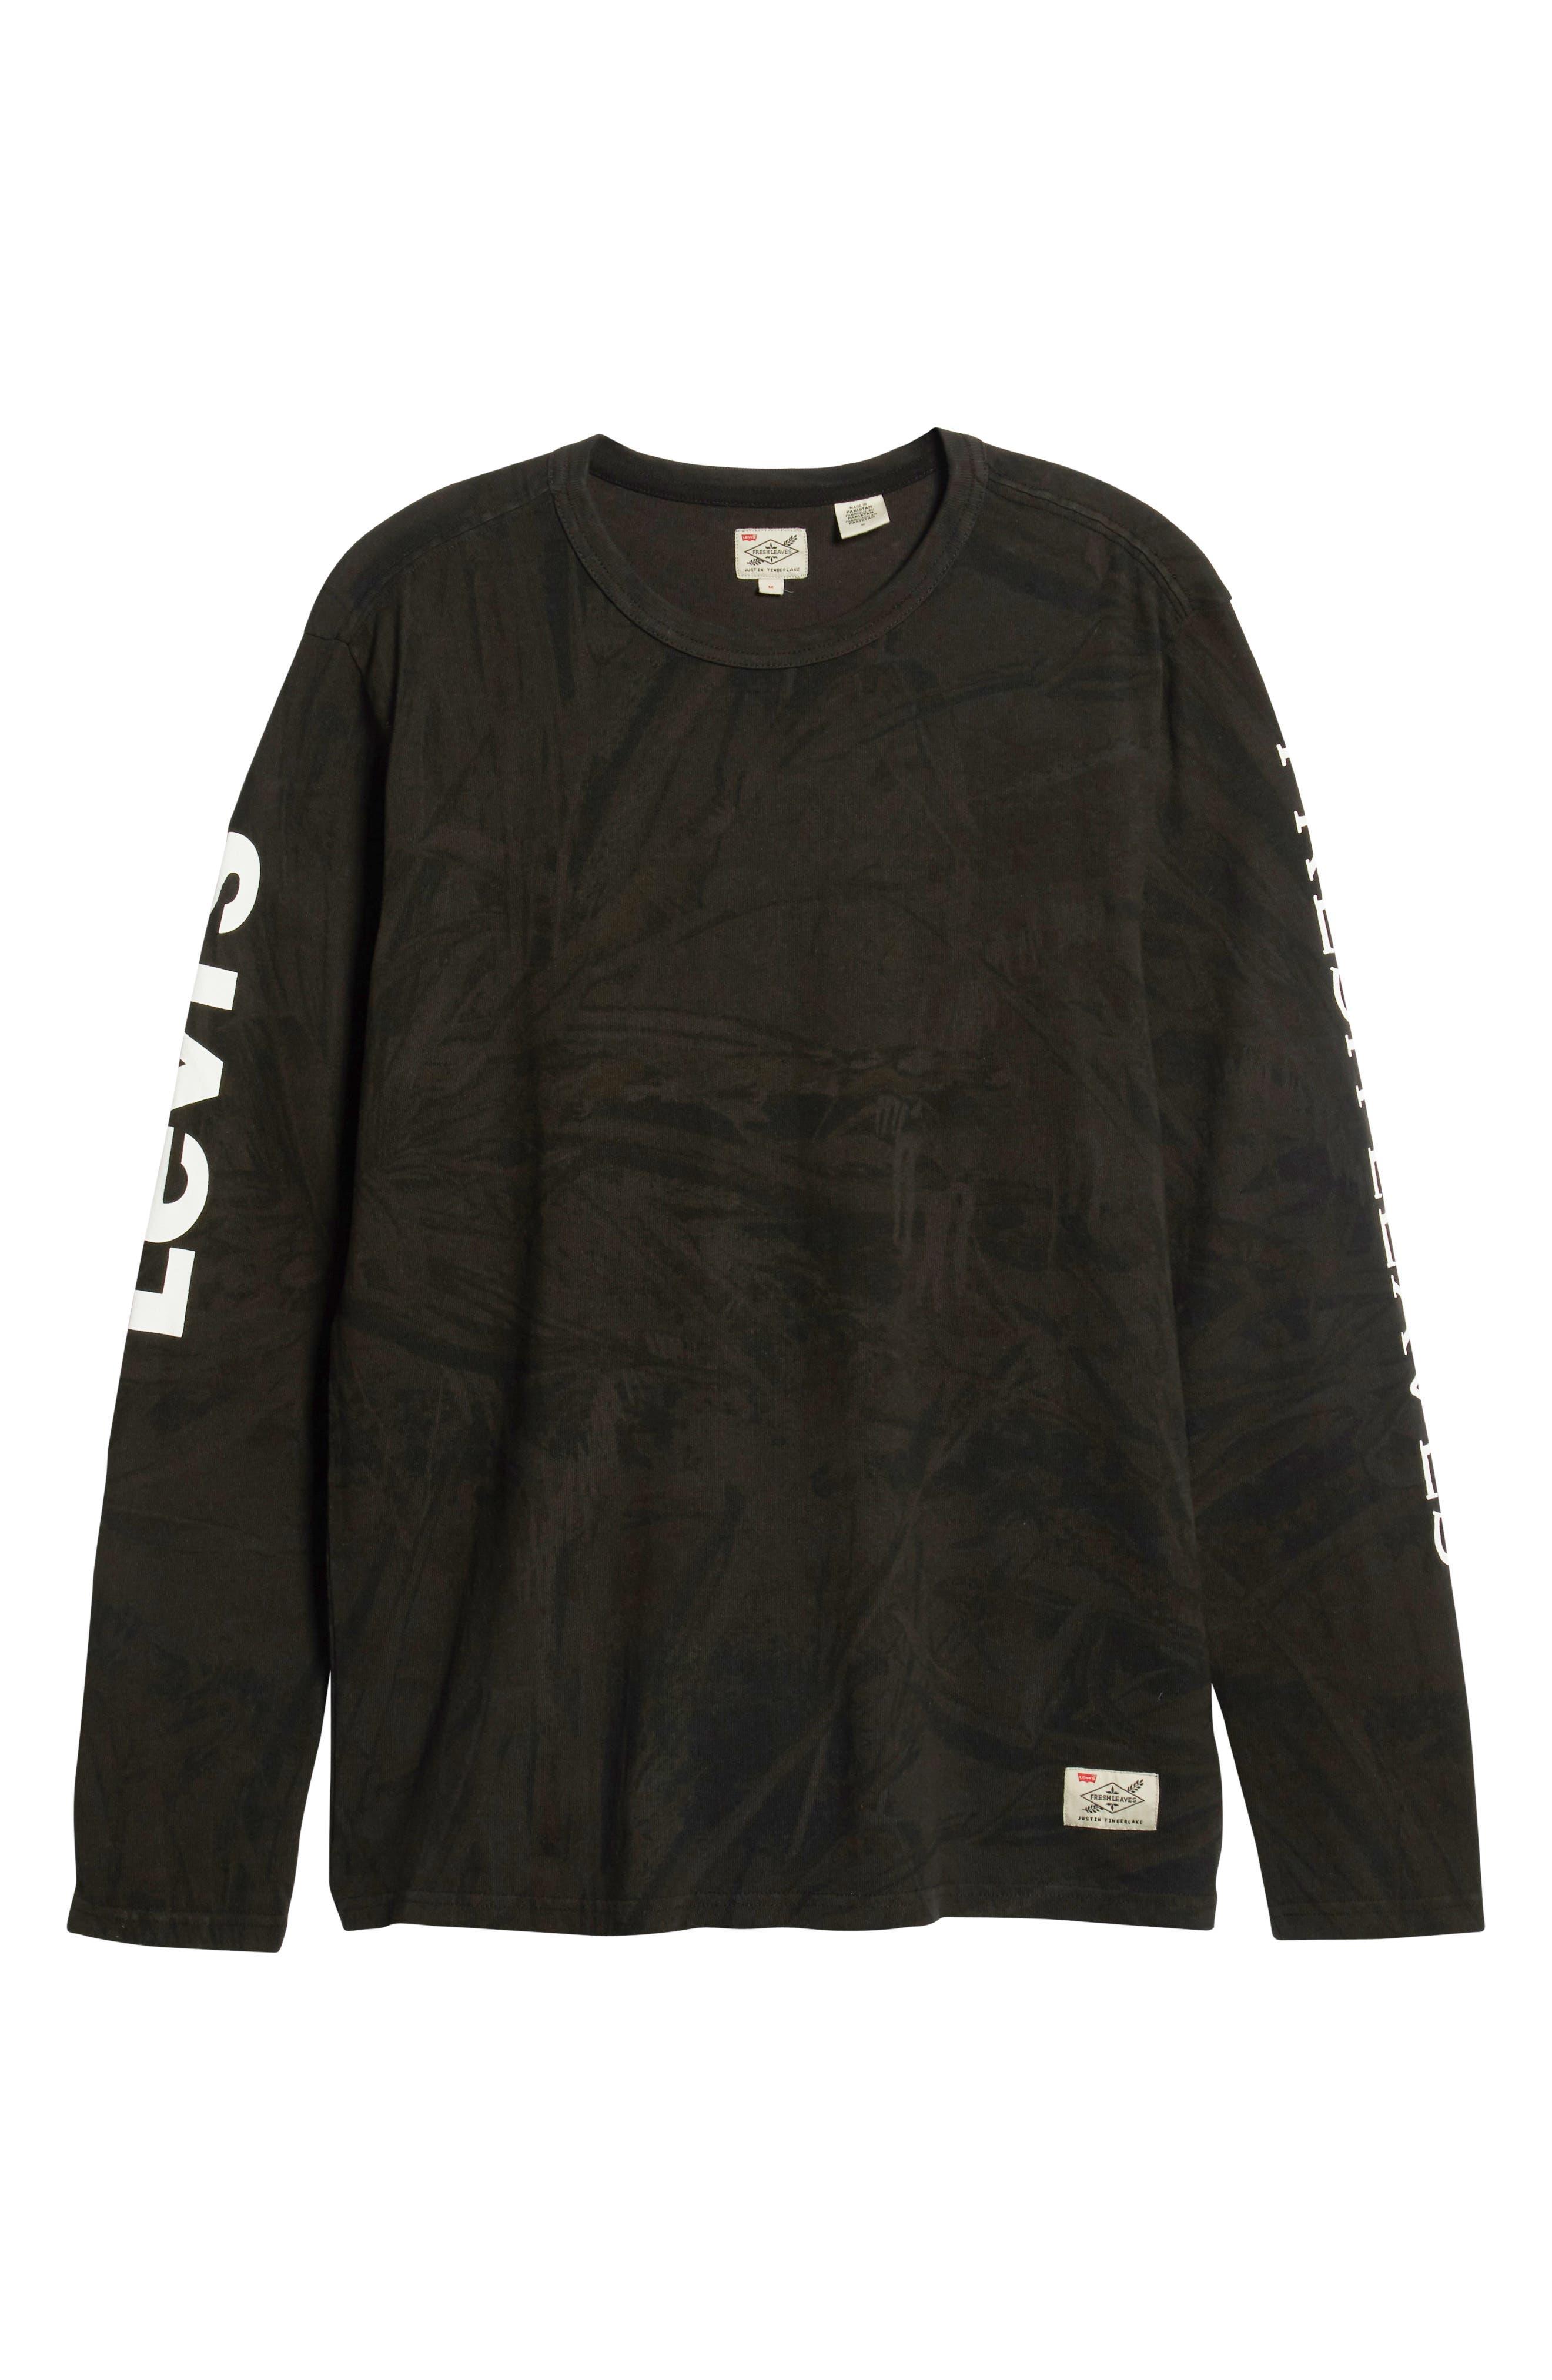 x Justin Timberlake Camo Long Sleeve T-Shirt,                             Alternate thumbnail 7, color,                             BLACK